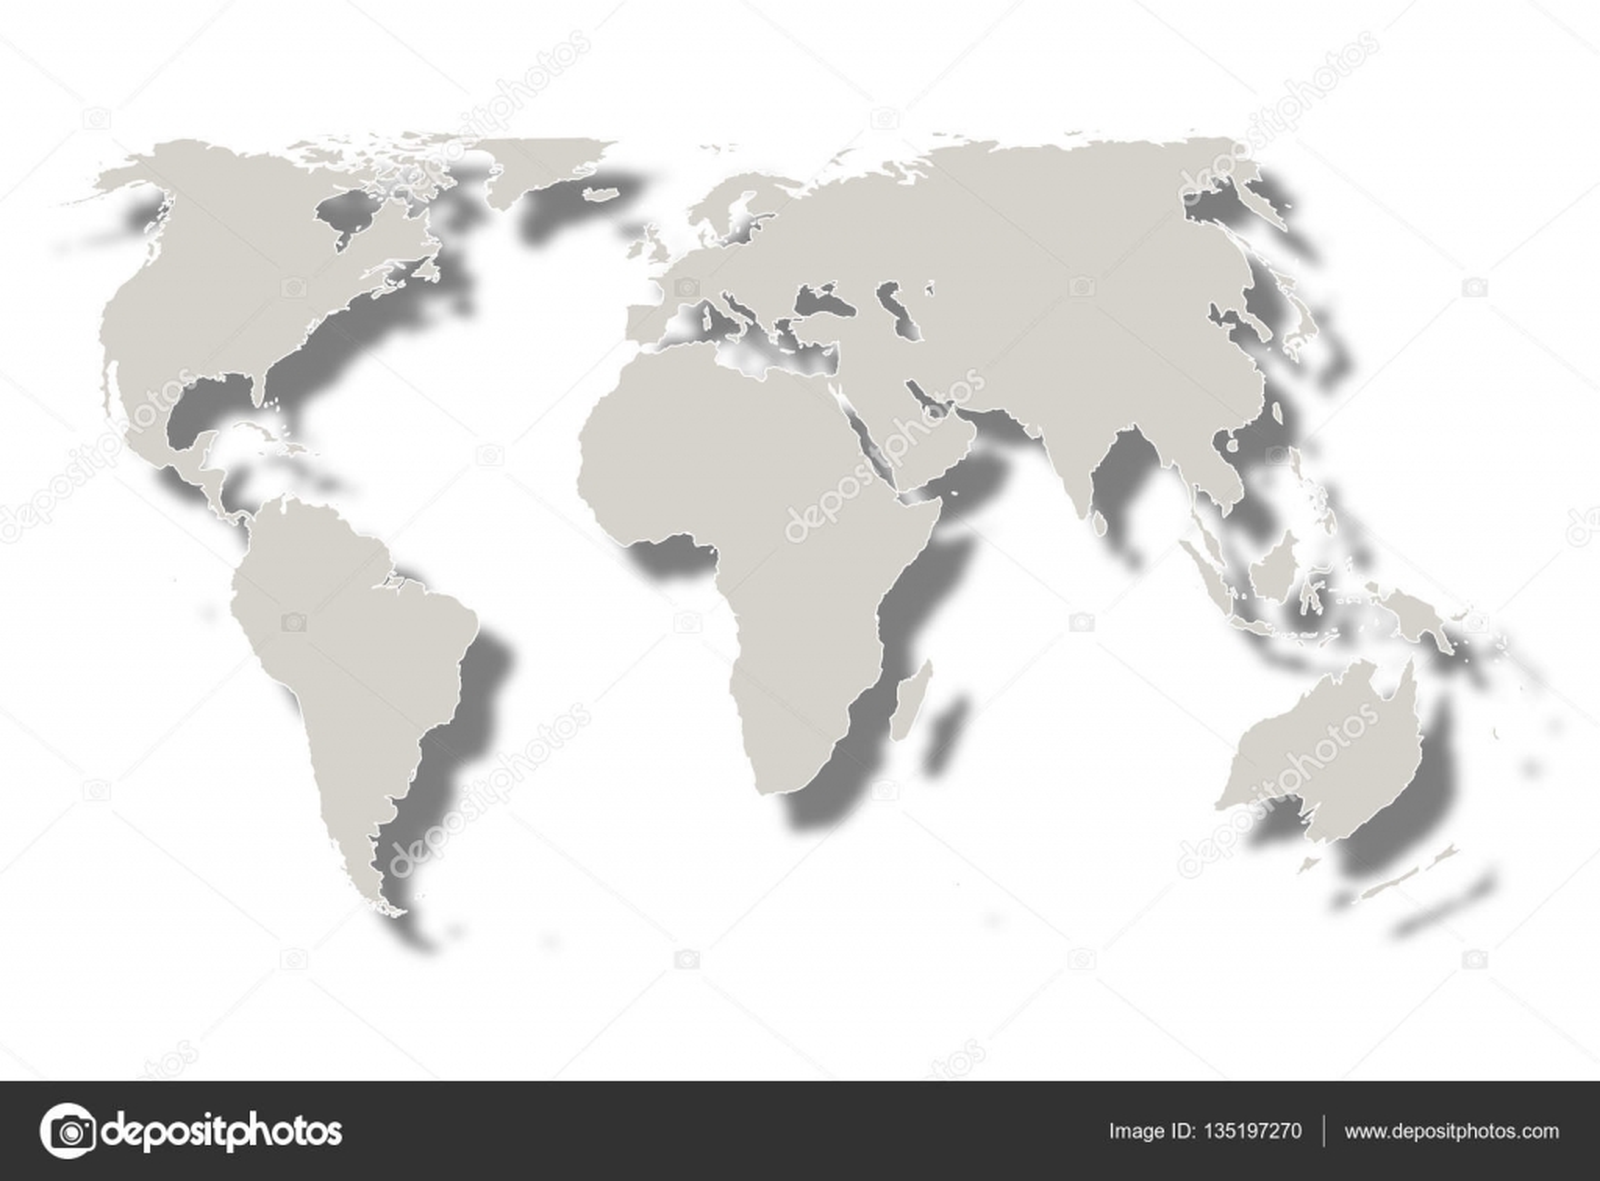 World map icon white stock vector jboy24 135197270 world map icon white stock vector gumiabroncs Image collections